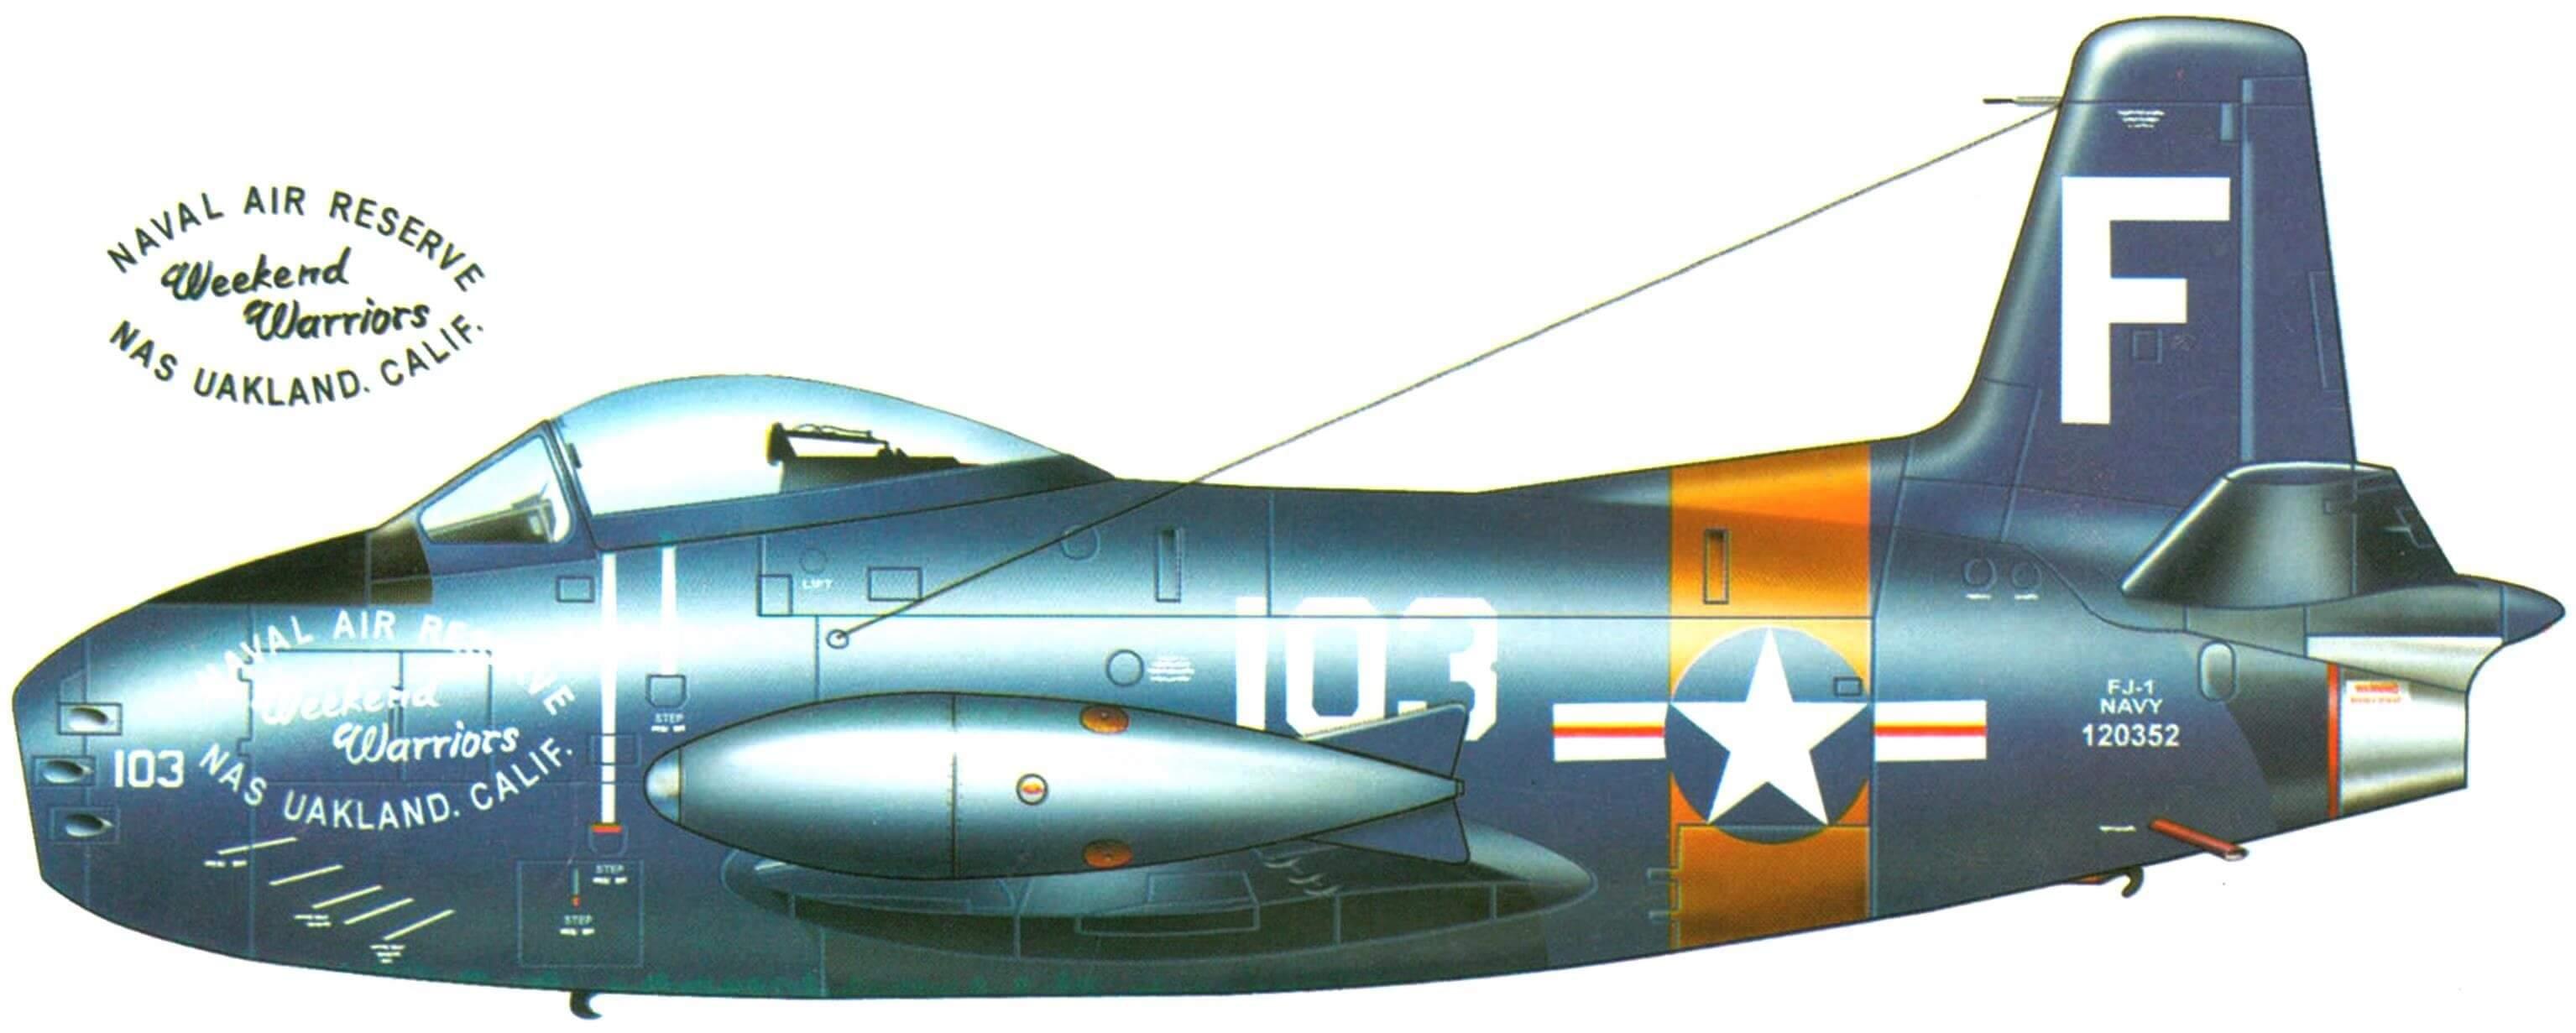 Истребитель FJ-1 авиации резерва ВМС США. Авиабаза Окланд